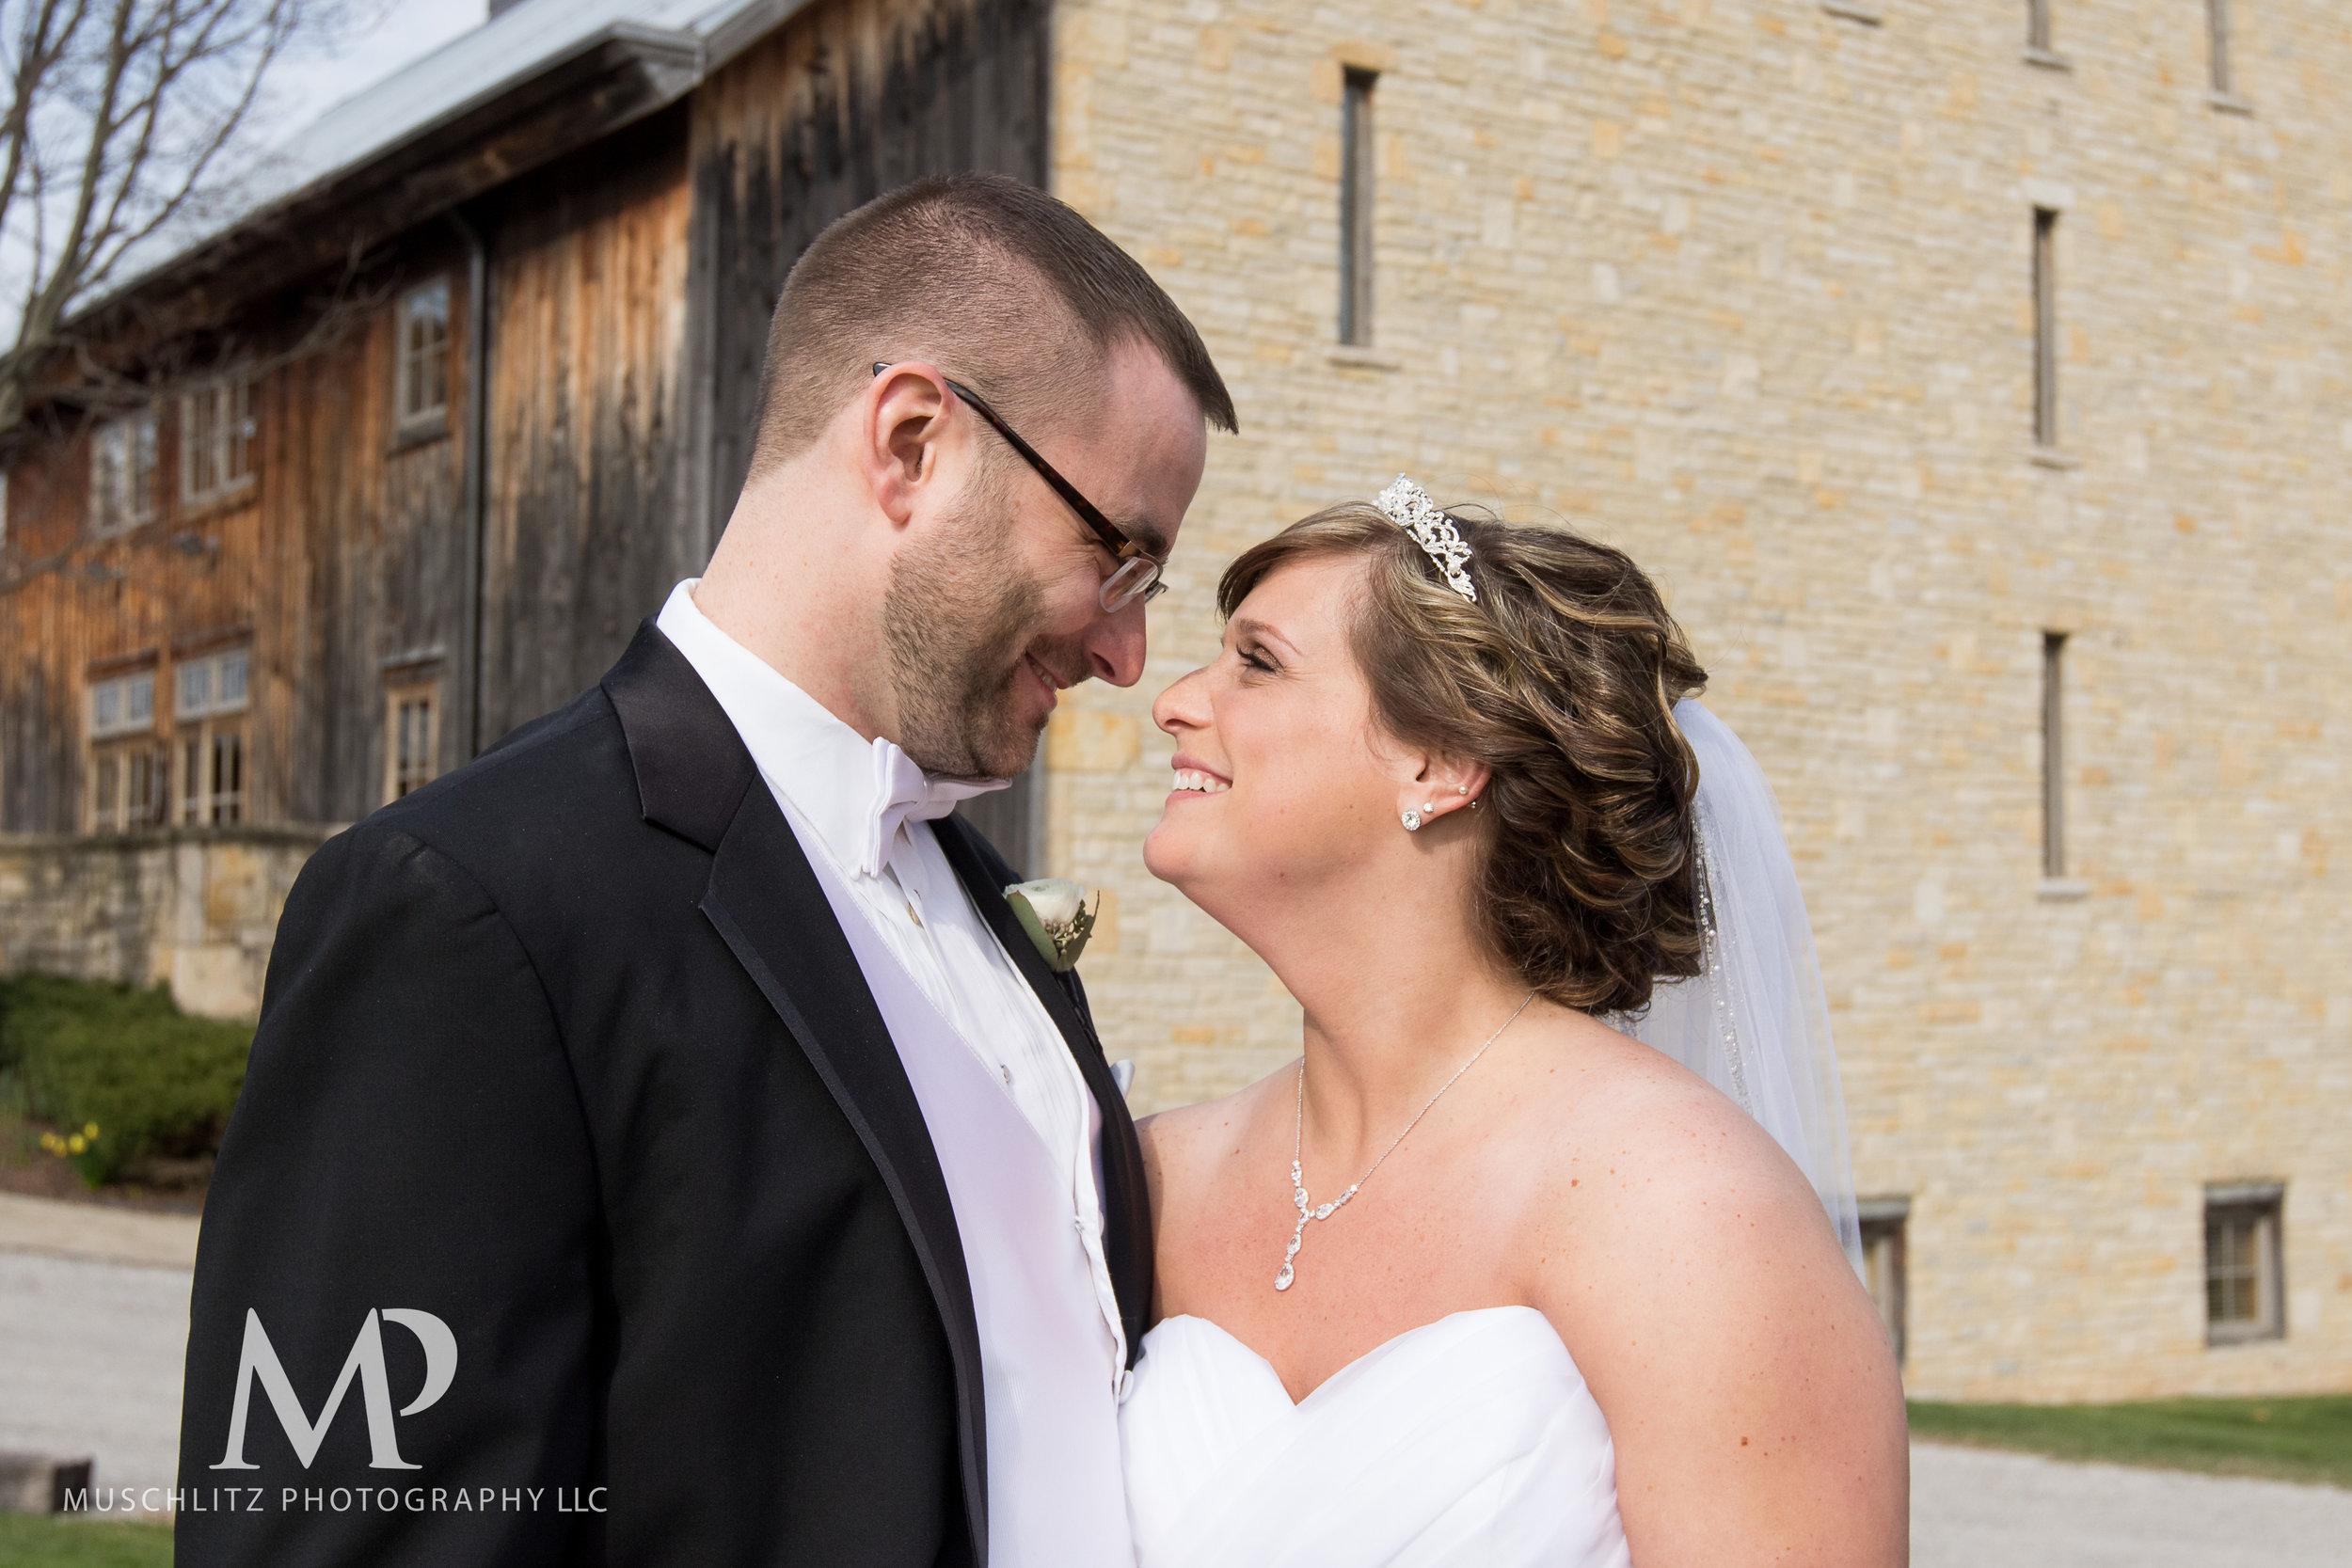 liberty-barn-presbyterian-church-wedding-delaware-columbus-ohio-muschlitz-photography-053.JPG